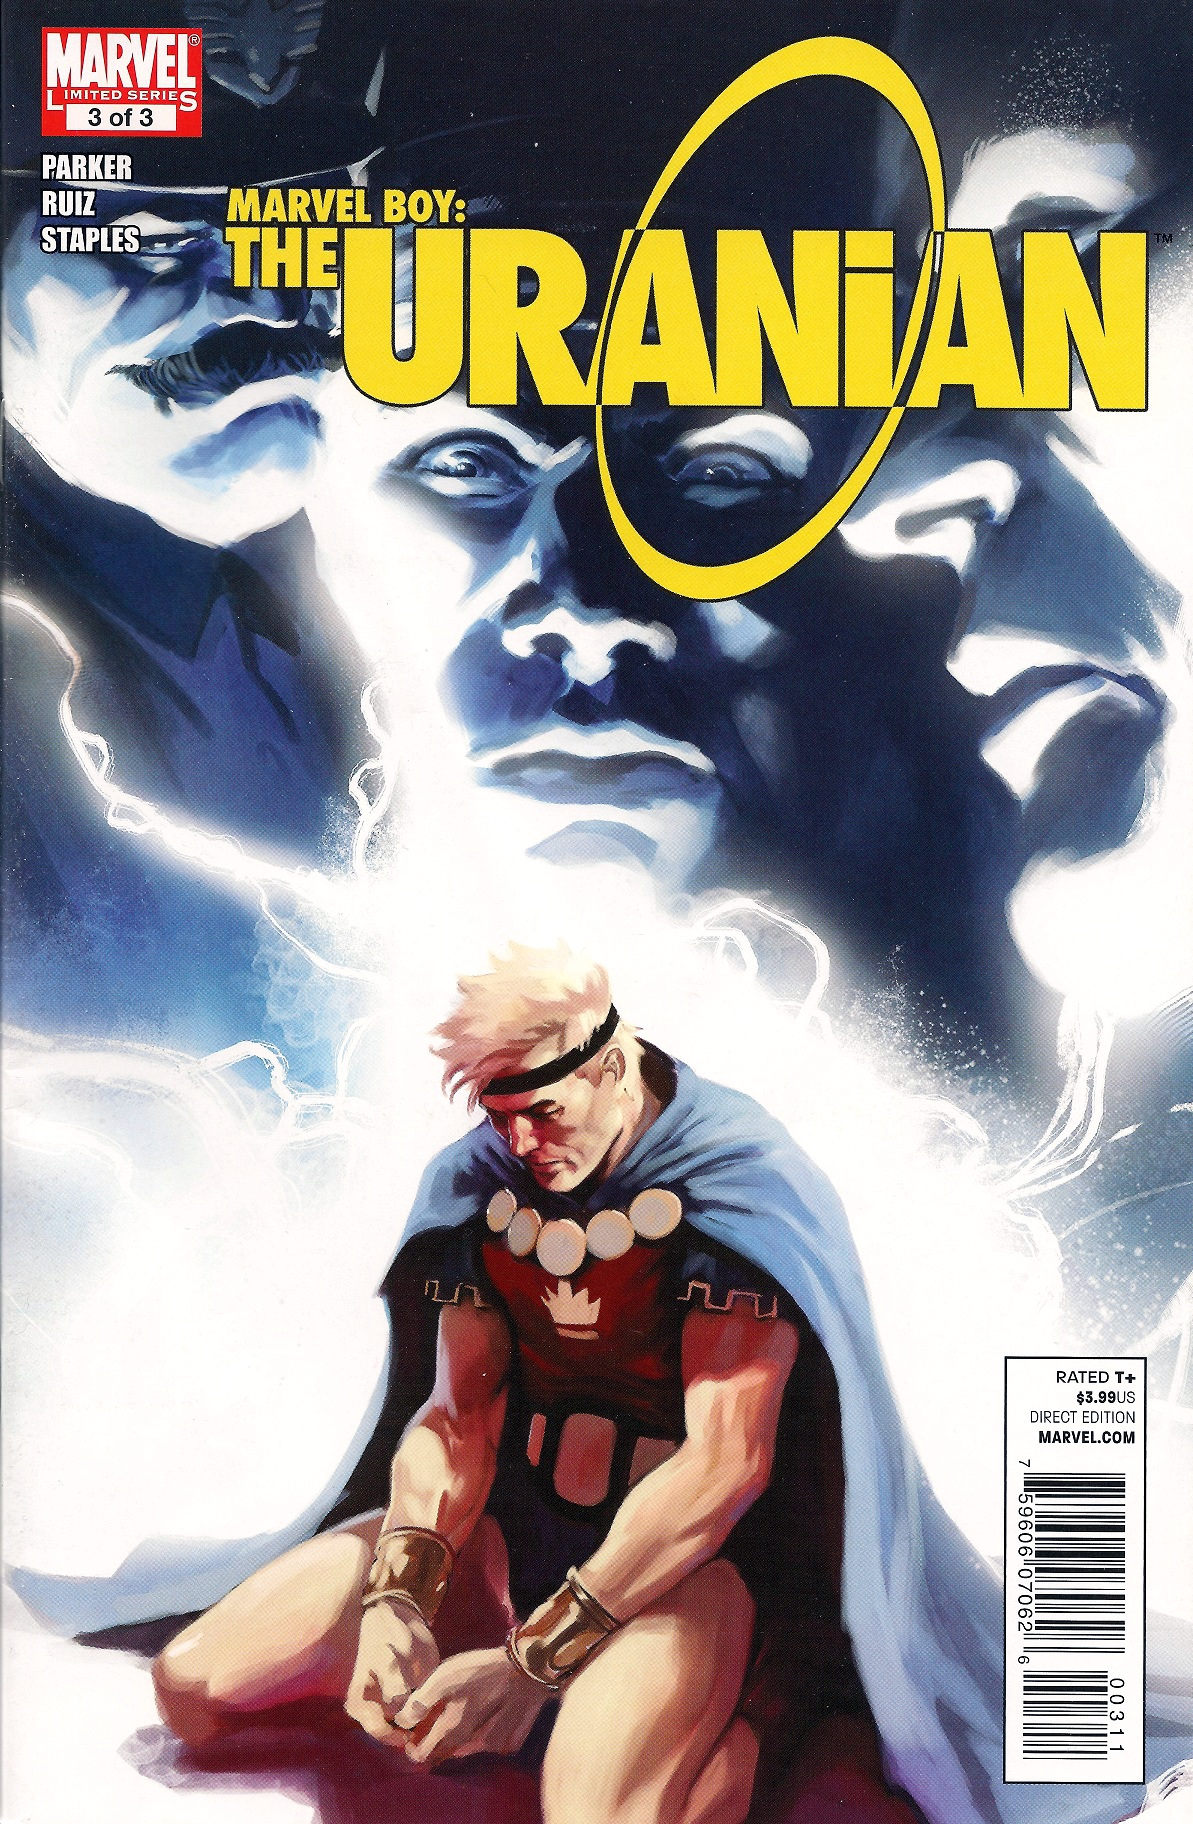 Marvel Boy: The Uranian Vol 1 3